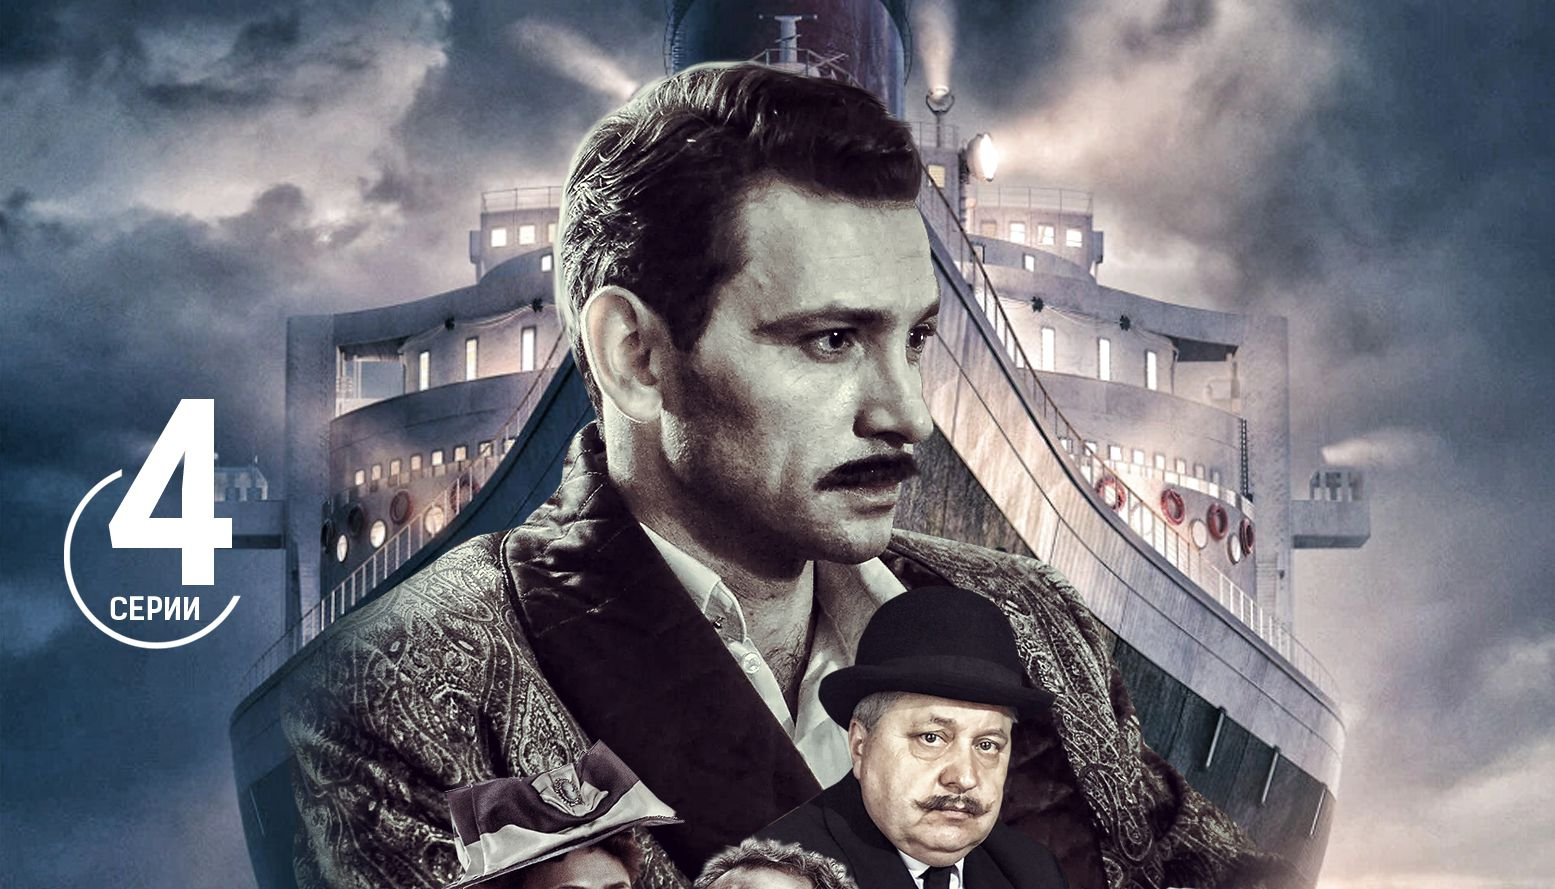 Адвокатъ Ардашевъ 4. Кровь на палубе (4 серии) (2021)